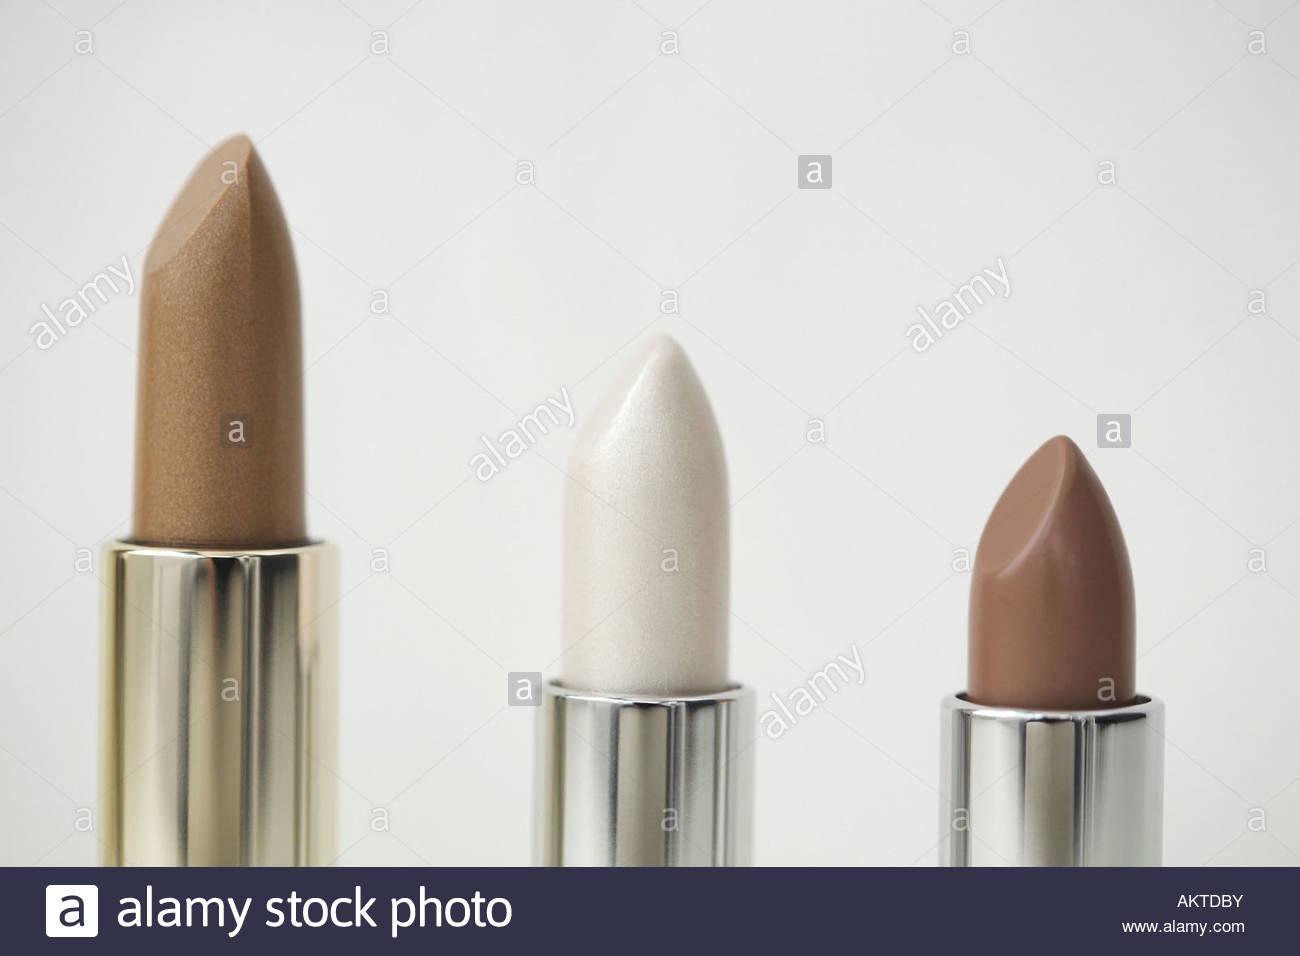 Three lipsticks - Stock Image